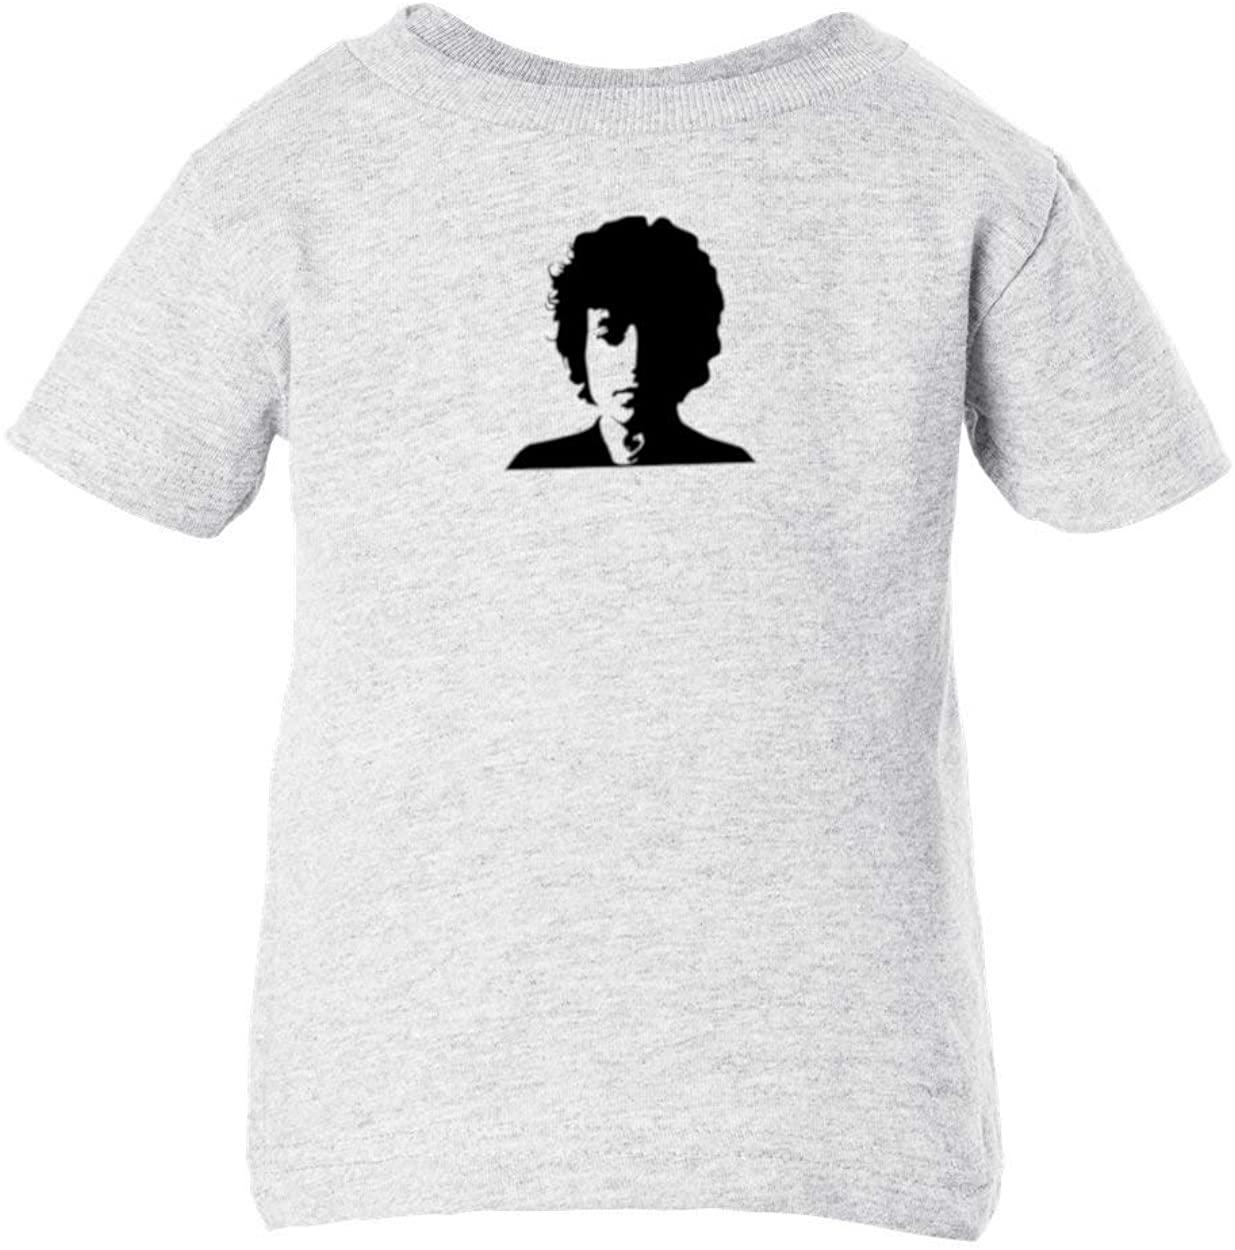 Mari Kyrios Bob The Poet Dylan Baby Clothes Toddler T-Shirt Folk Rock & Roll PJ